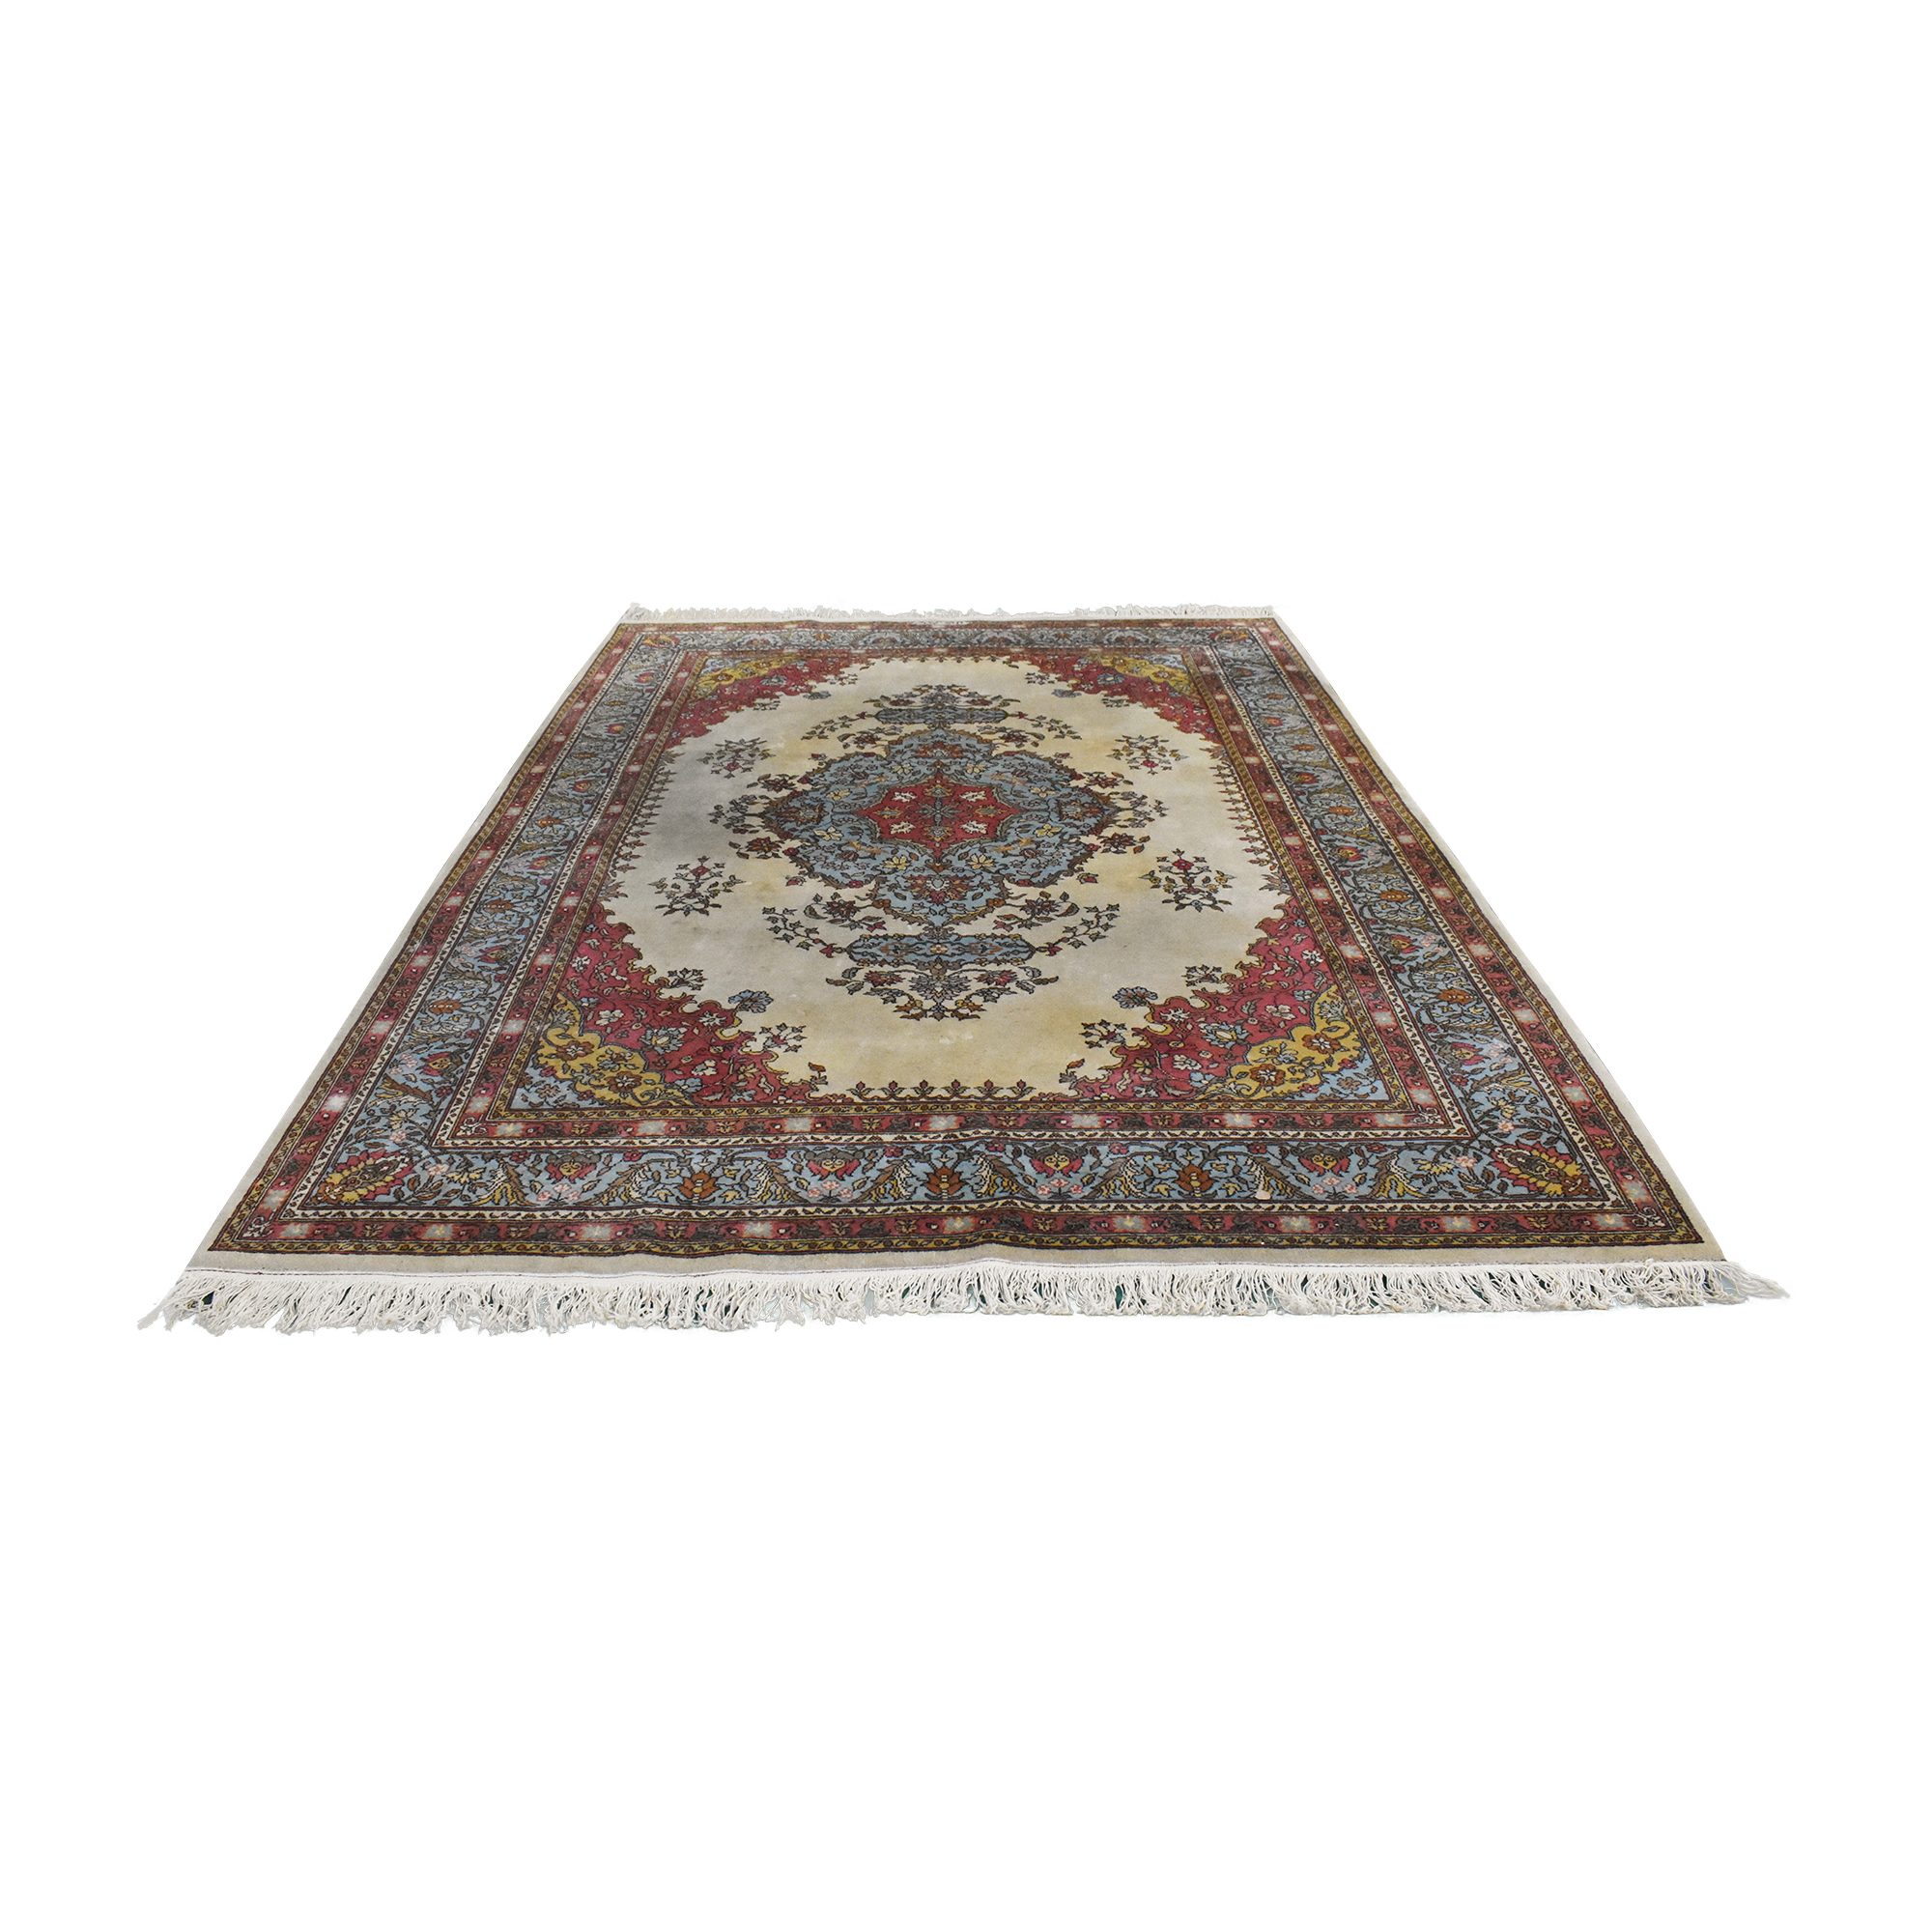 Persian Style Area Rug / Decor